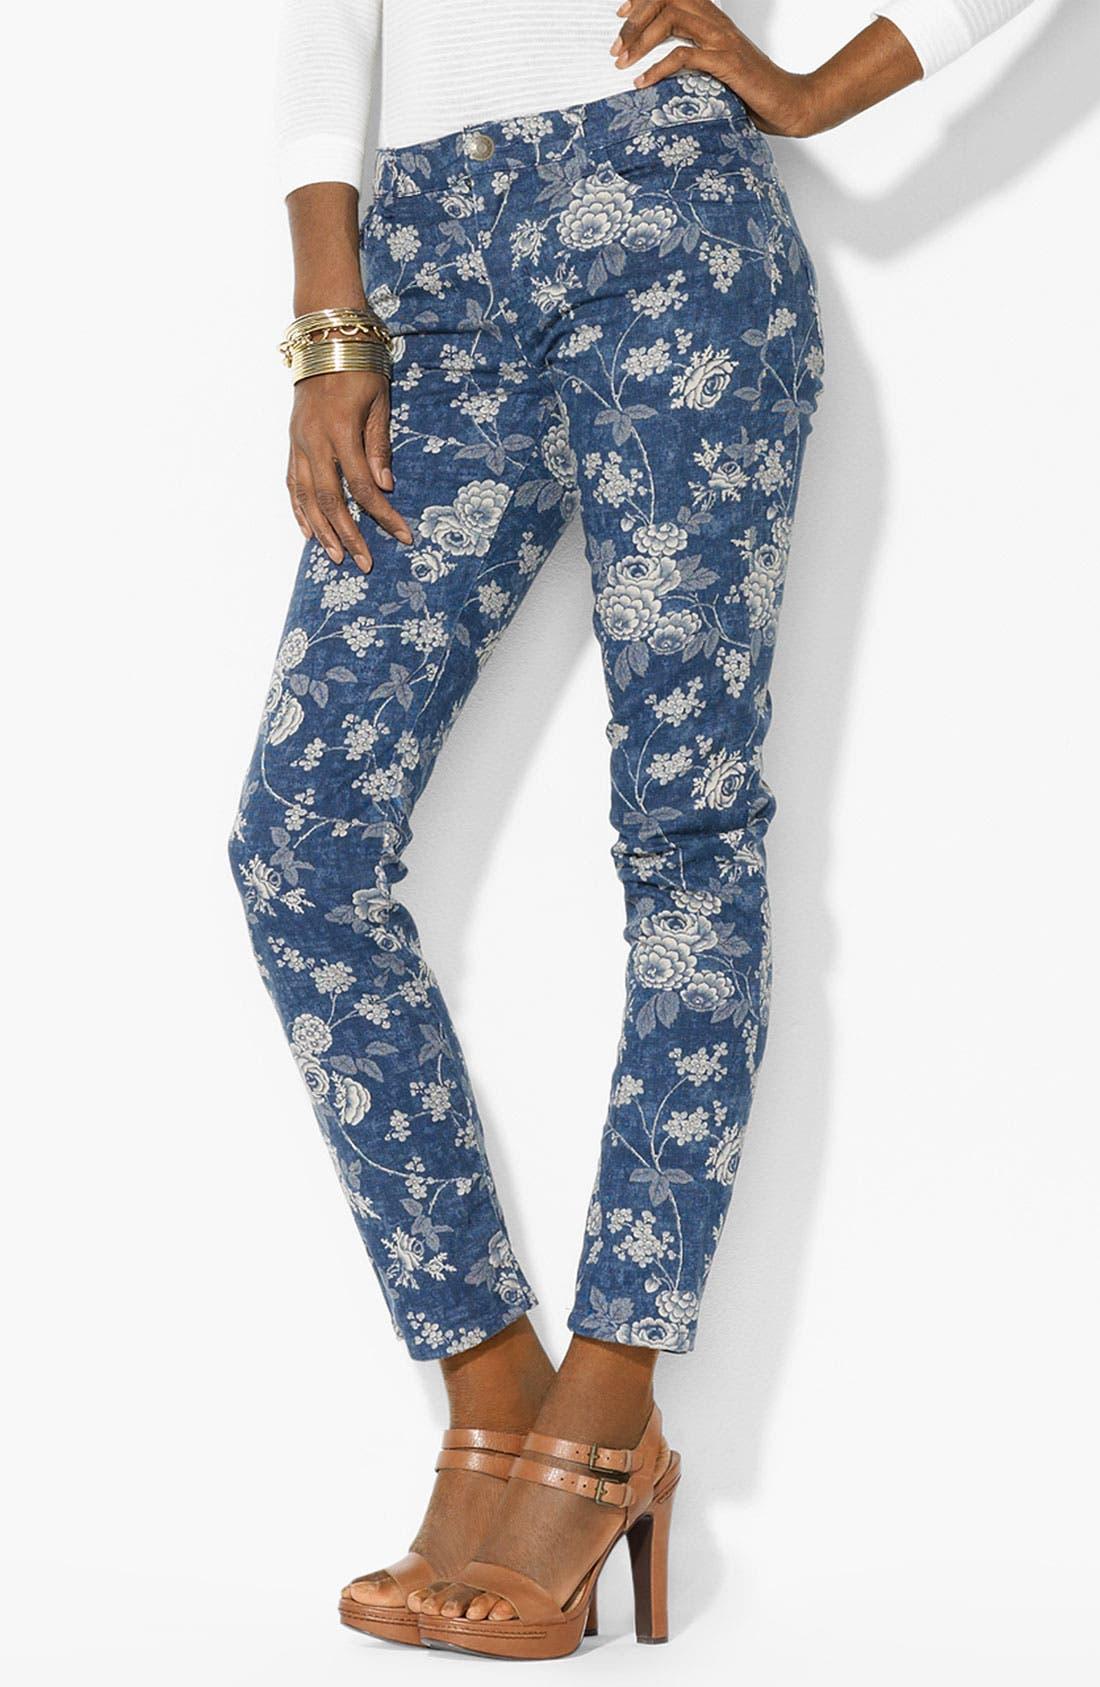 Alternate Image 1 Selected - Lauren Ralph Lauren Print Straight Leg Ankle Pants (Petite) (Online Only)